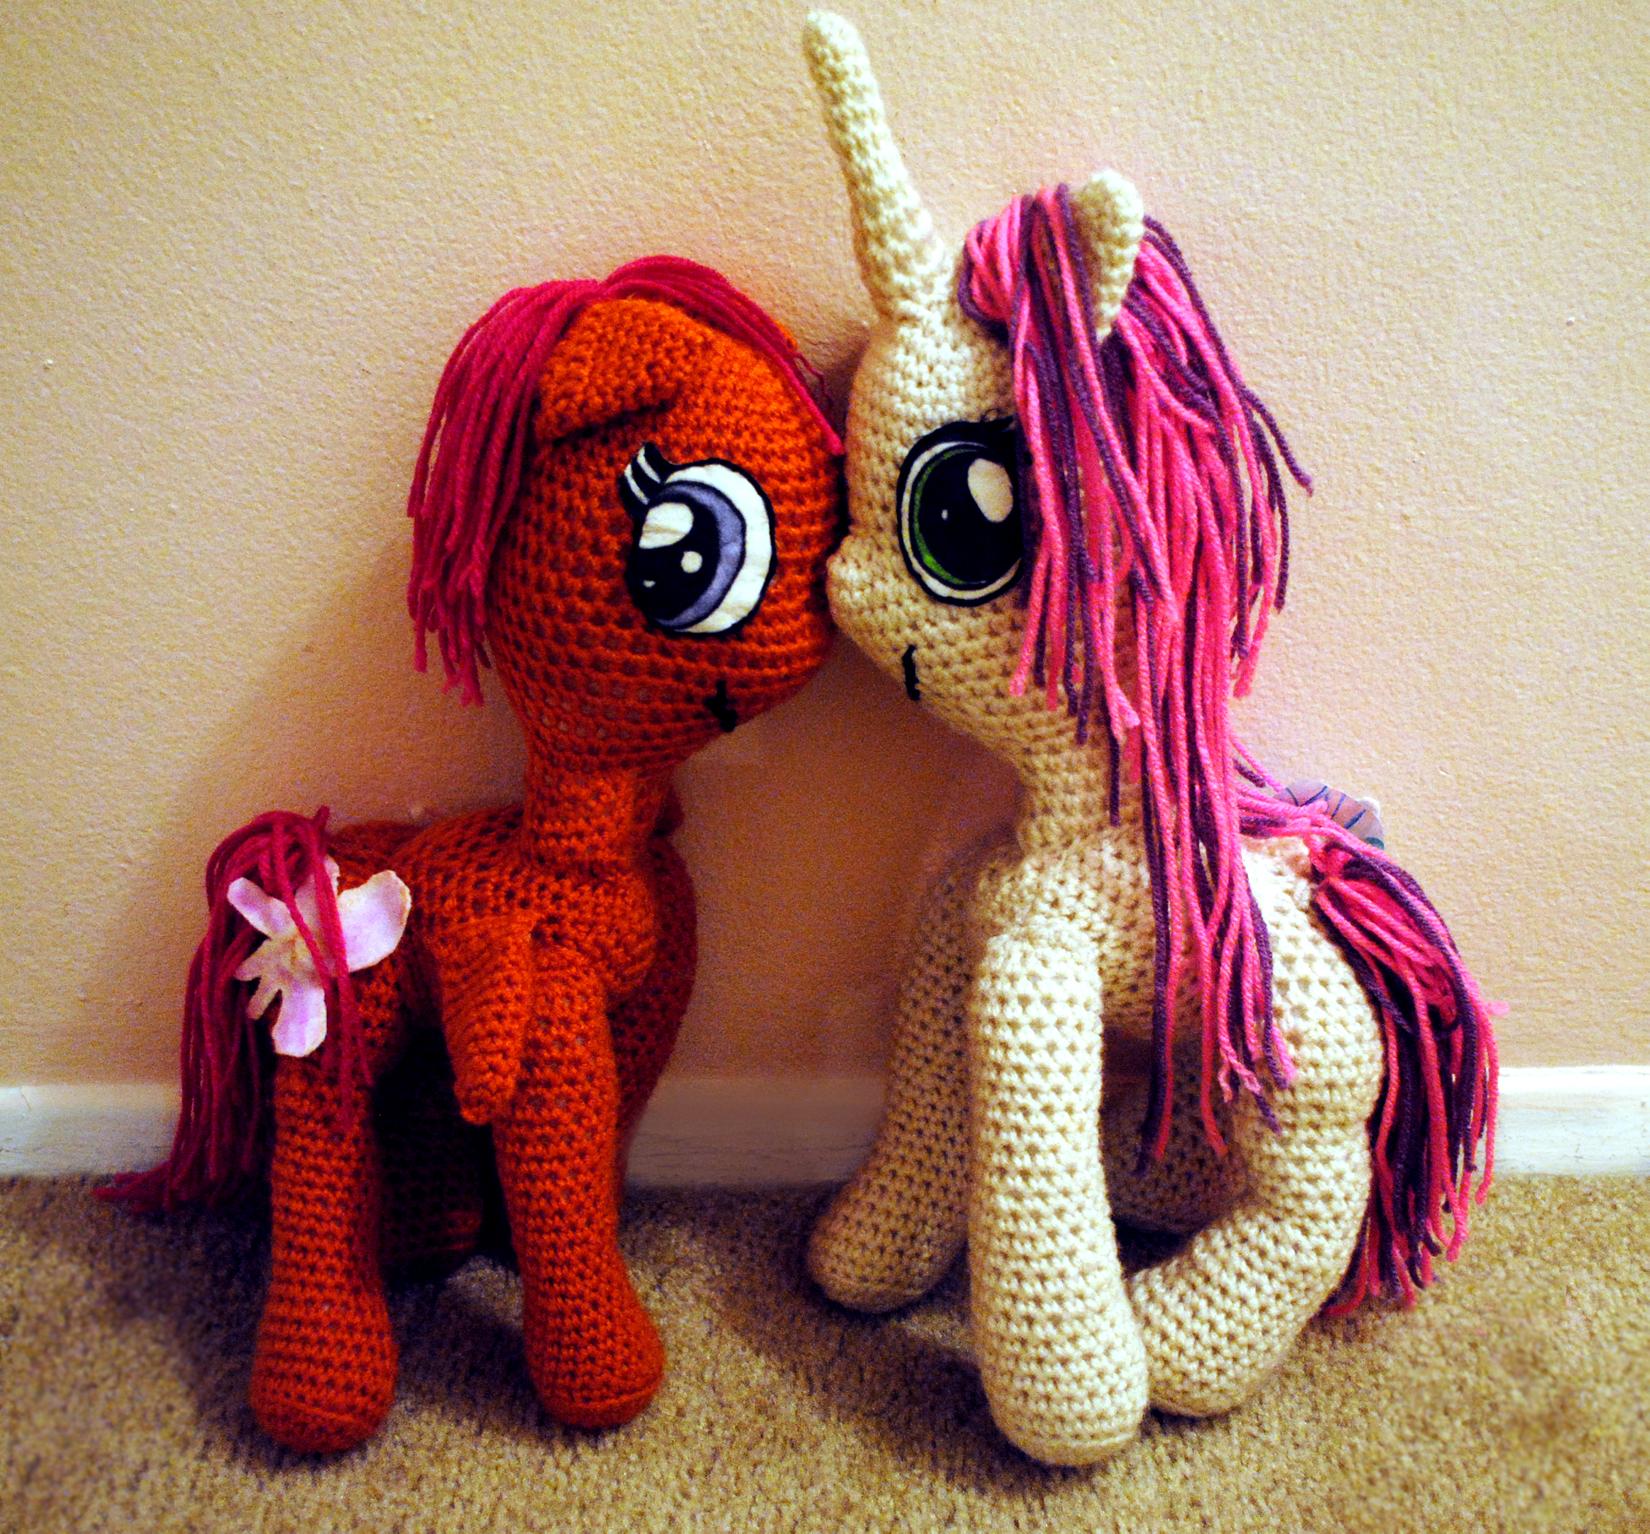 Crochet My Little Pony Toys Mellie Blossom